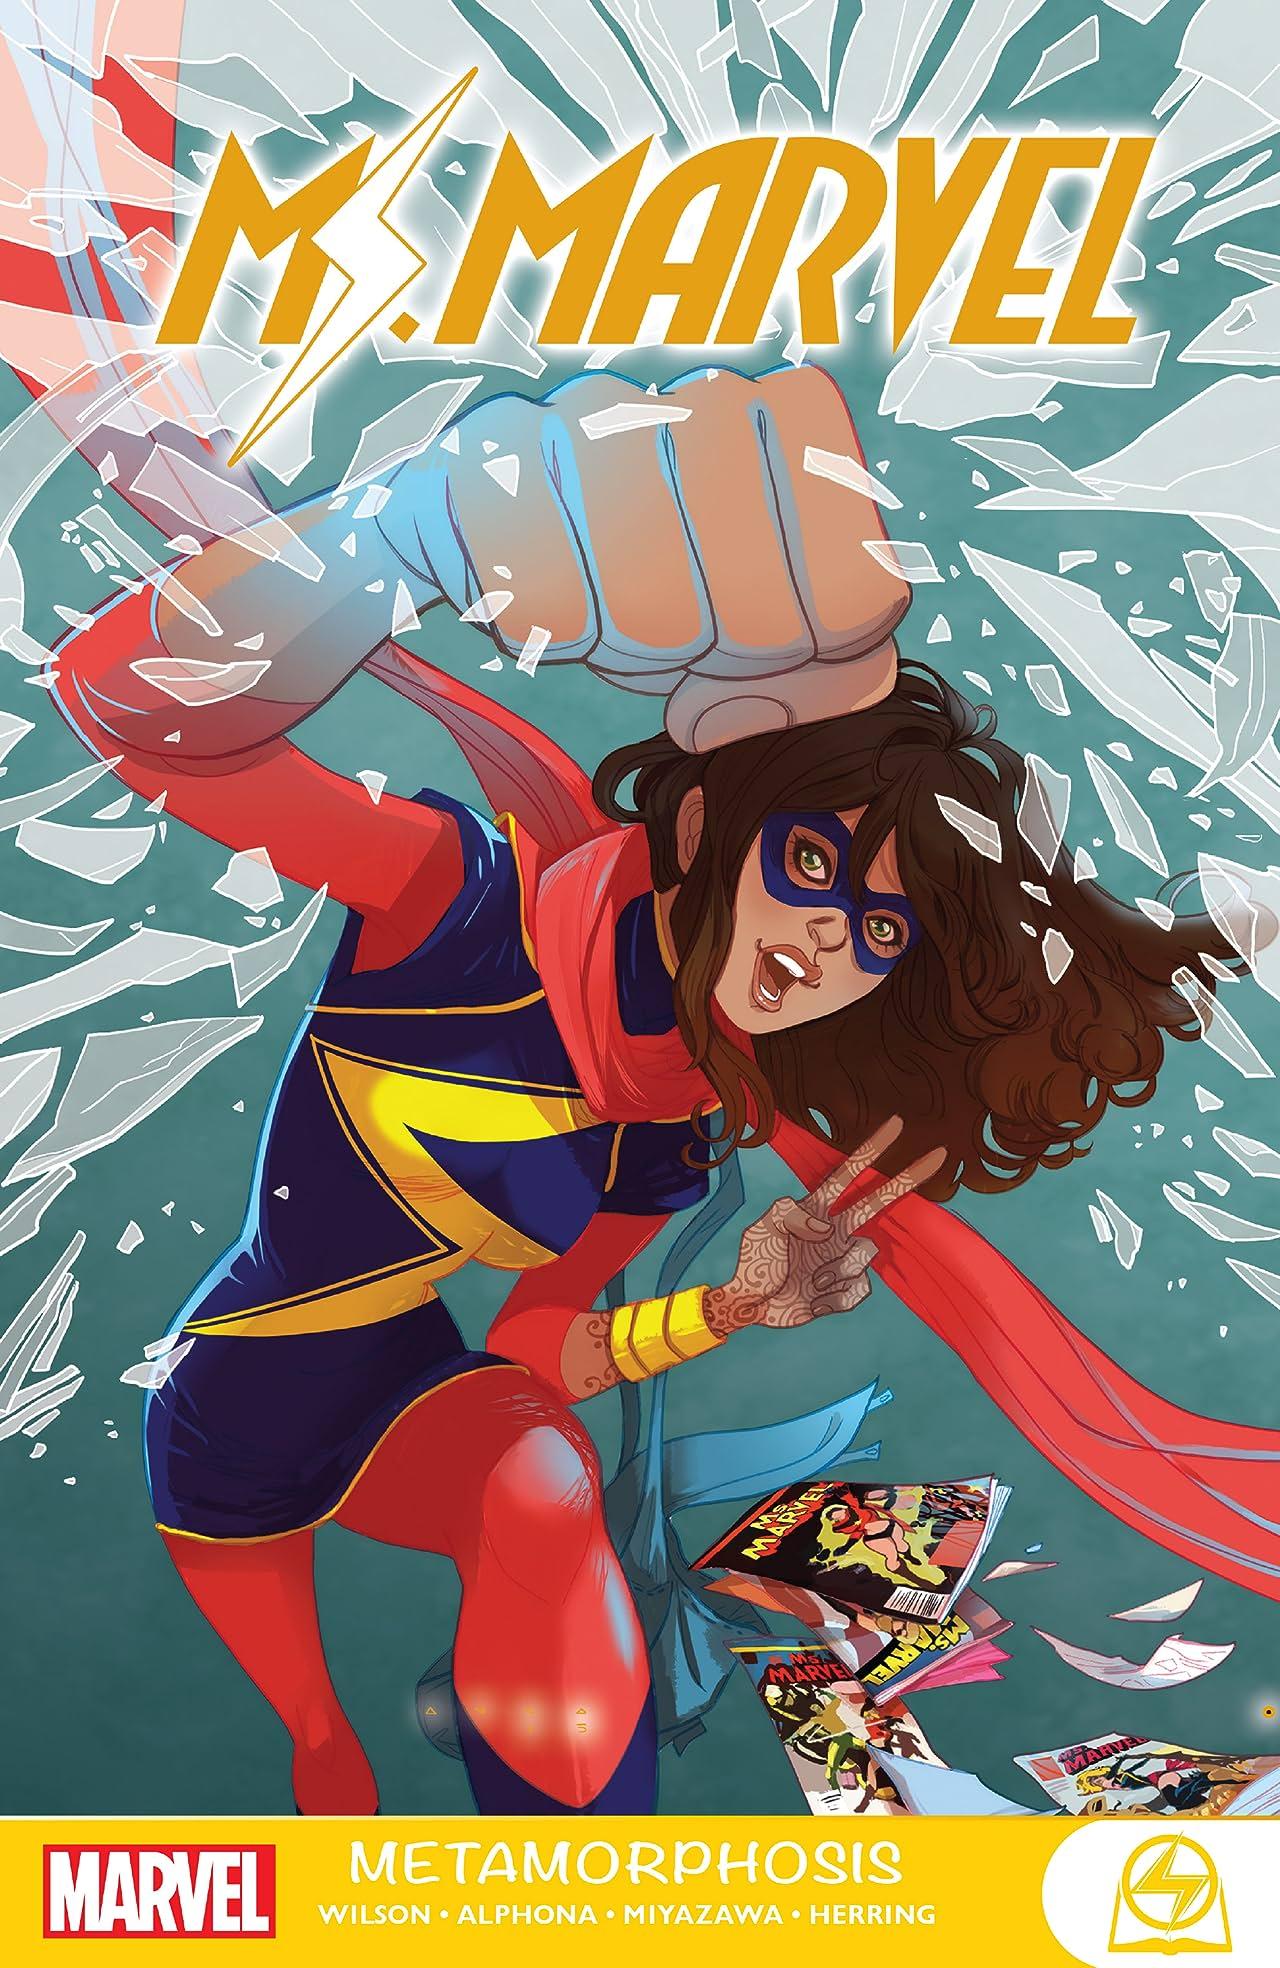 Ms. Marvel: Metamorphosis